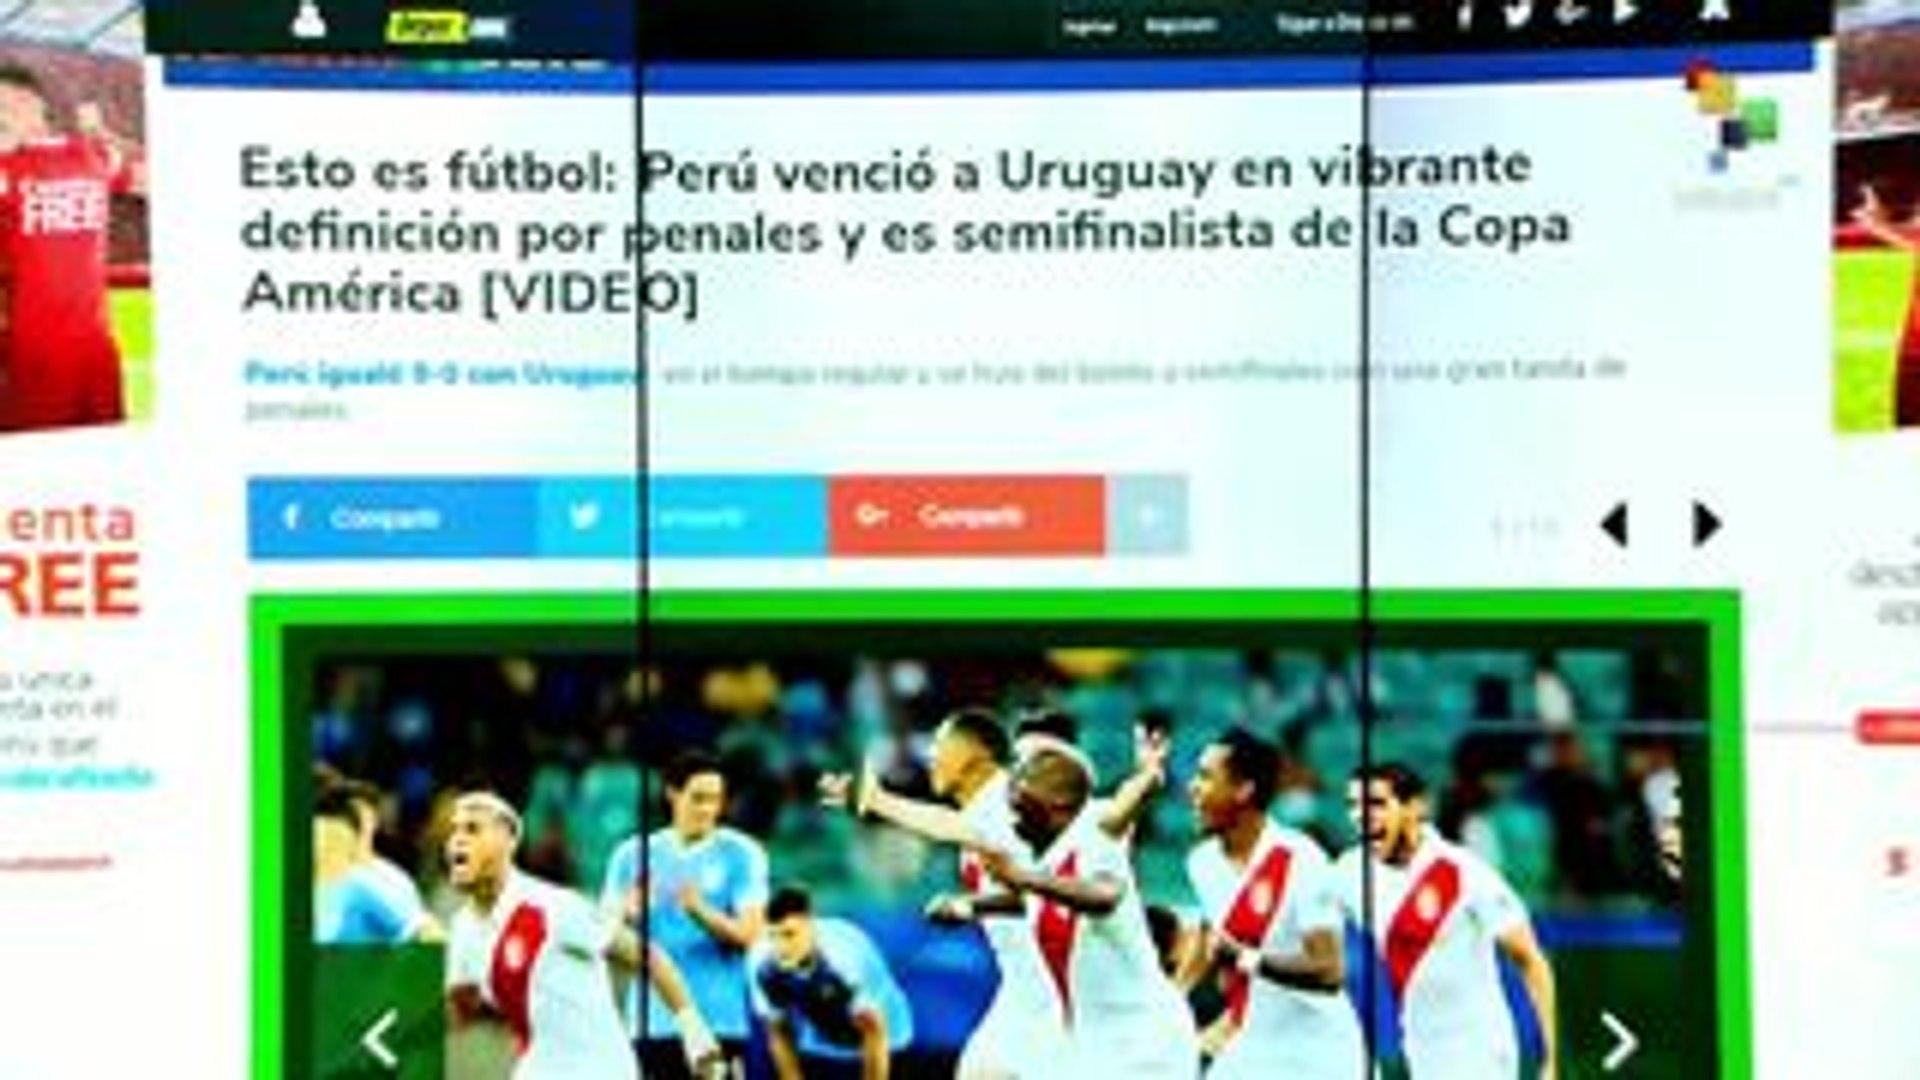 El Golazo de América: Perú pasa a las semifinales de la Copa América